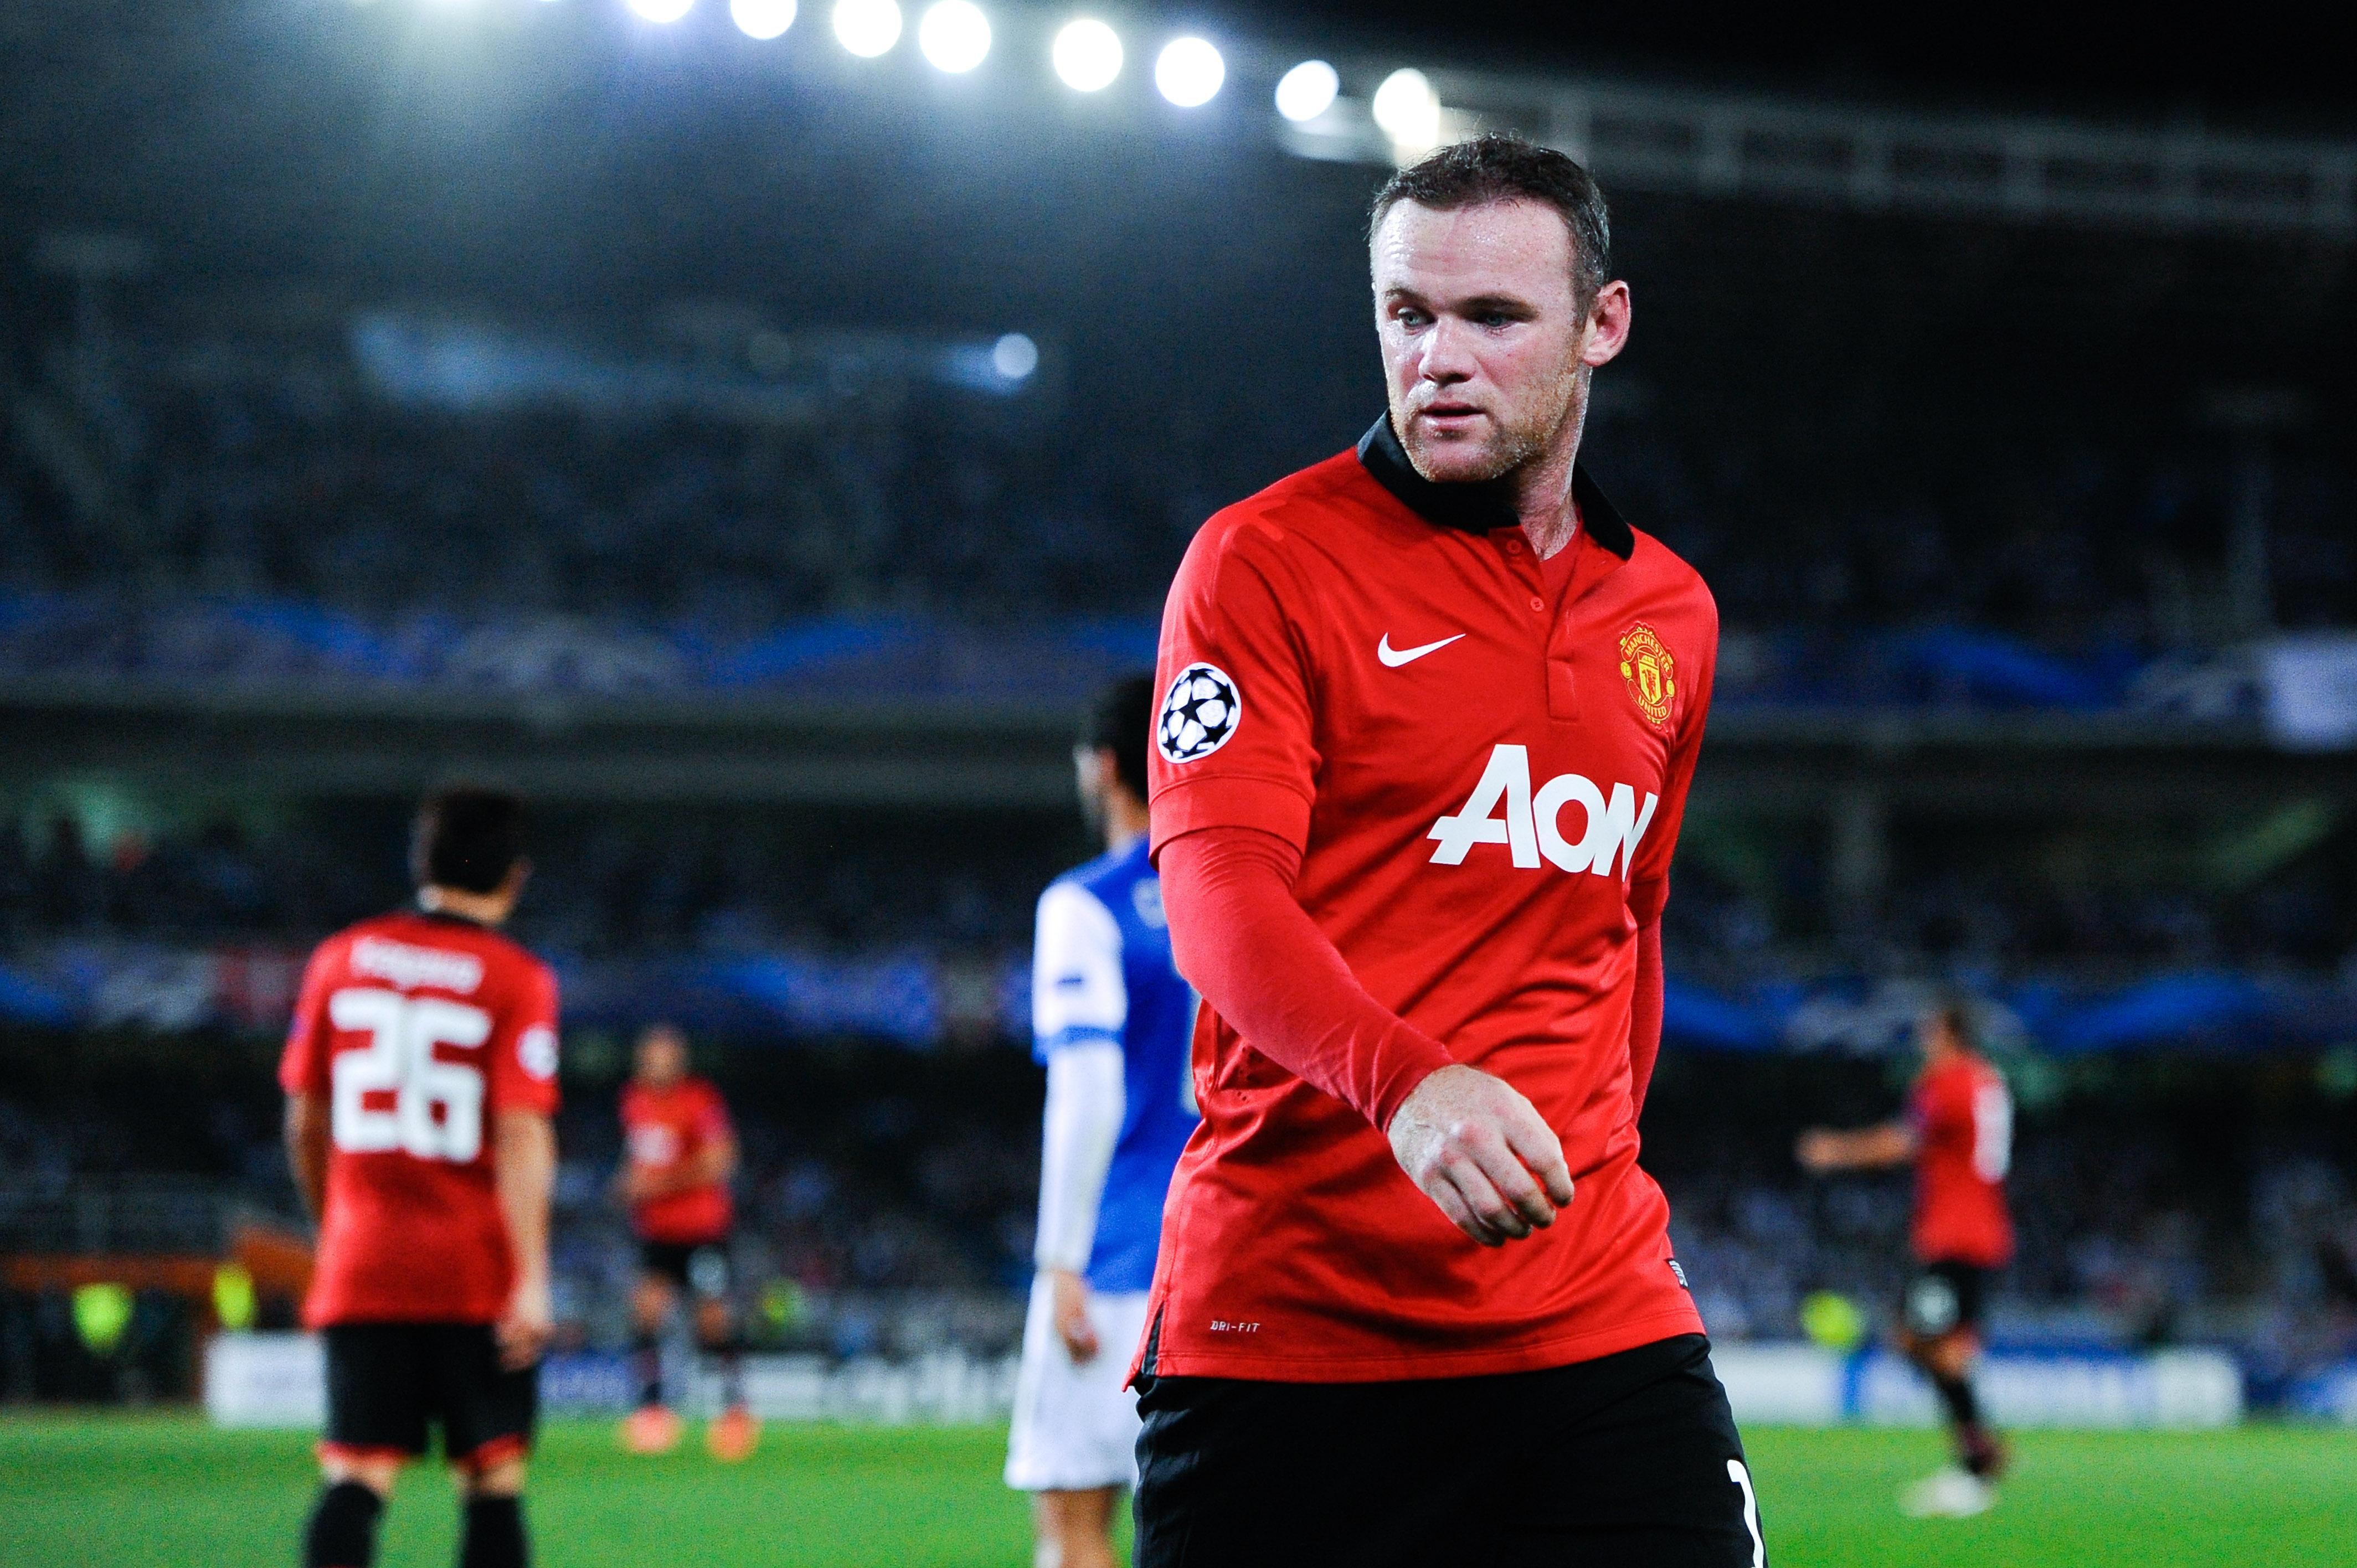 Real Sociedad de Futbol v Manchester United - UEFA Champions League